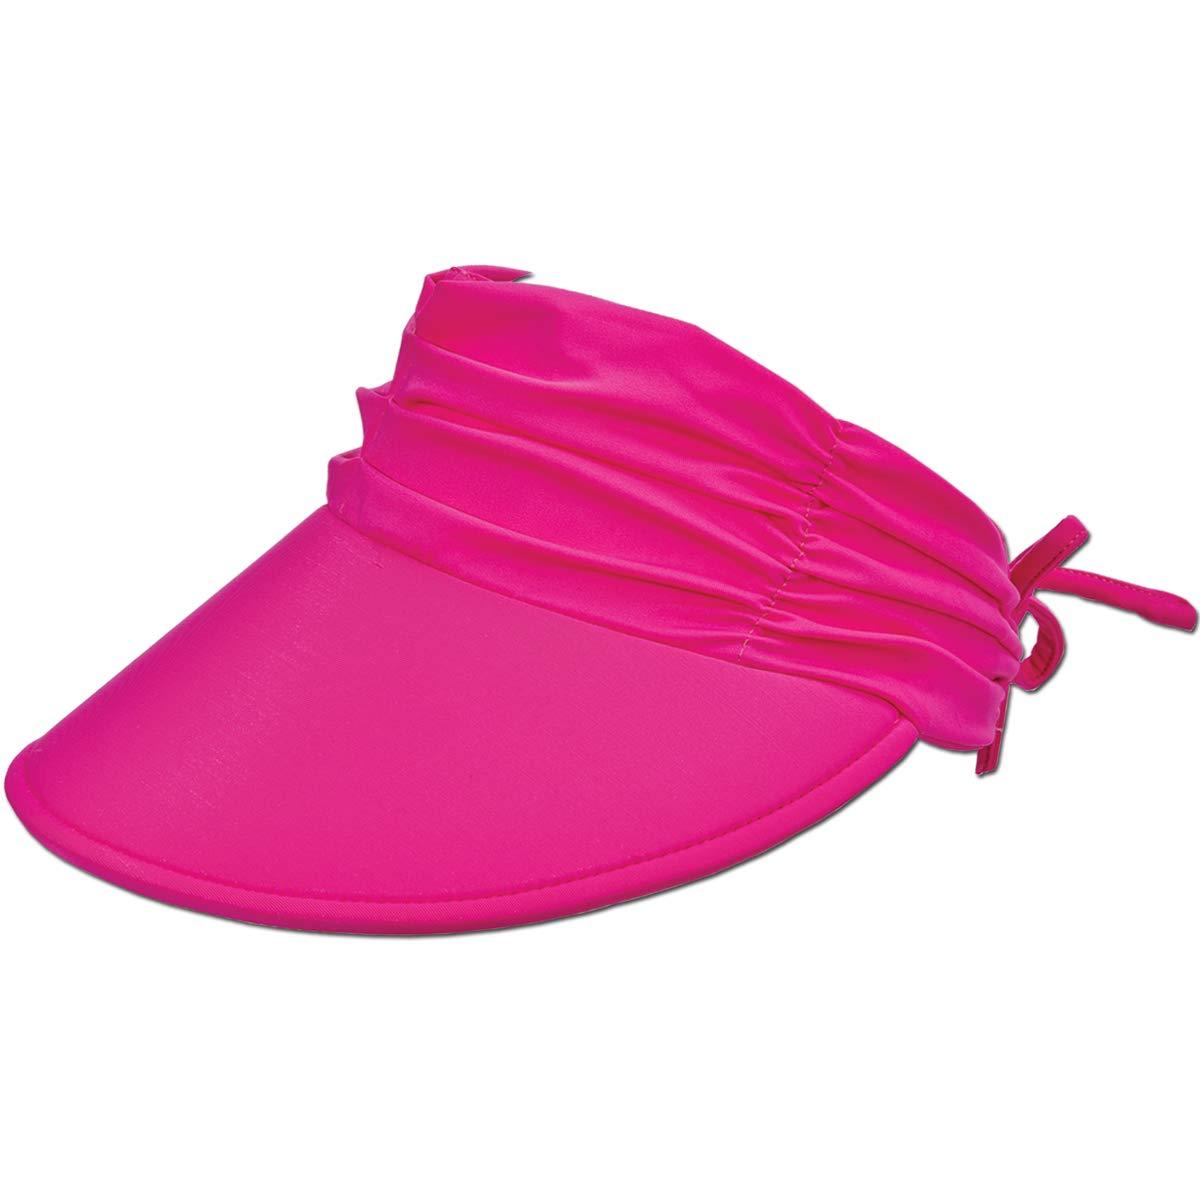 Lightweight Packable 4 Wide Floating Big Brim with Embroidered Logo Panama Jack Womens Sun Visor Hat Adjustable Tie